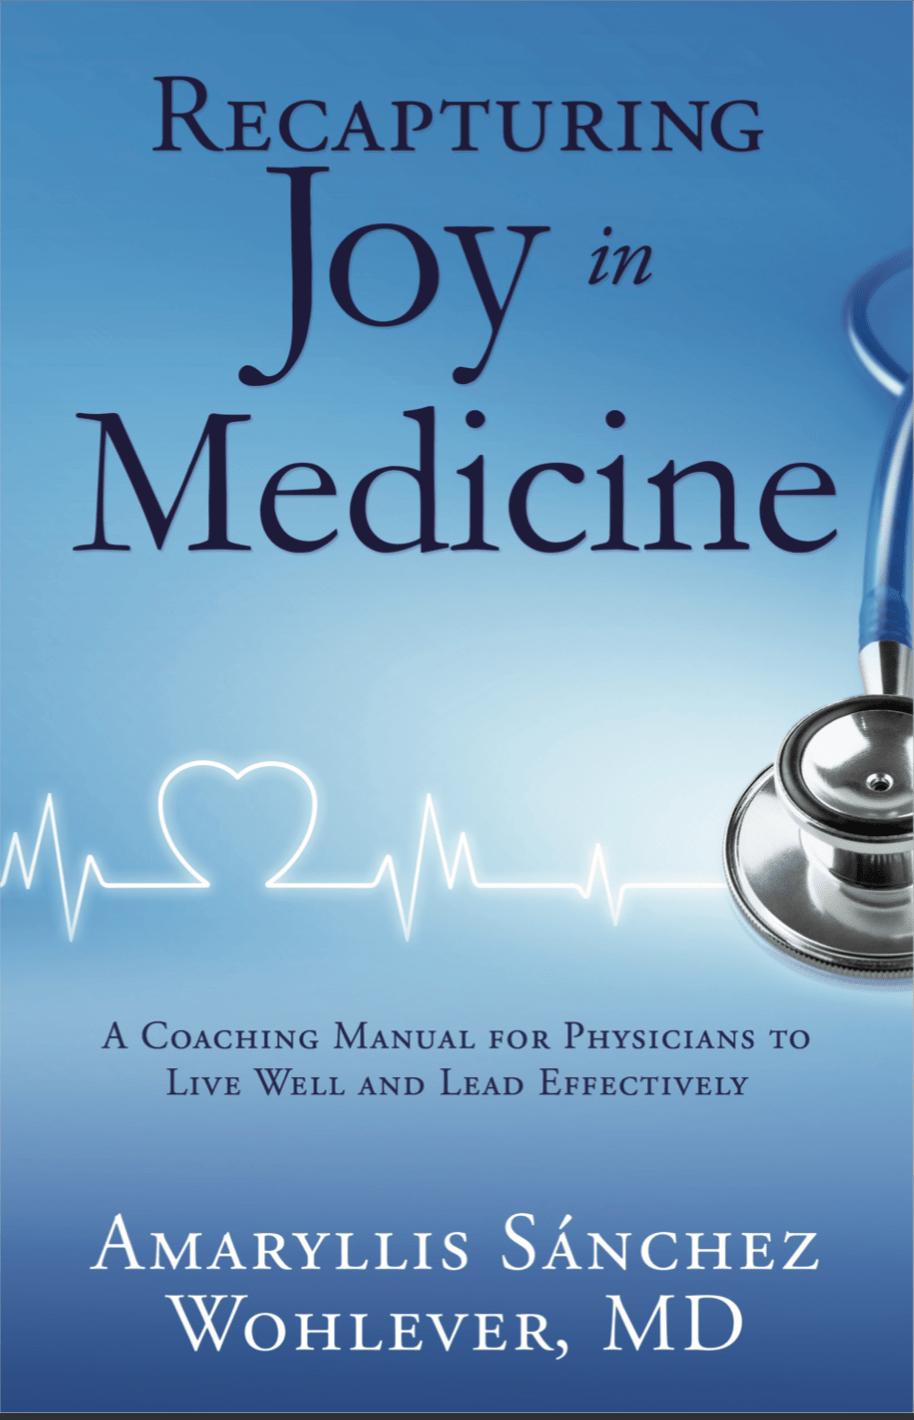 Recapturing Joy In Medicine_Front Cover-min